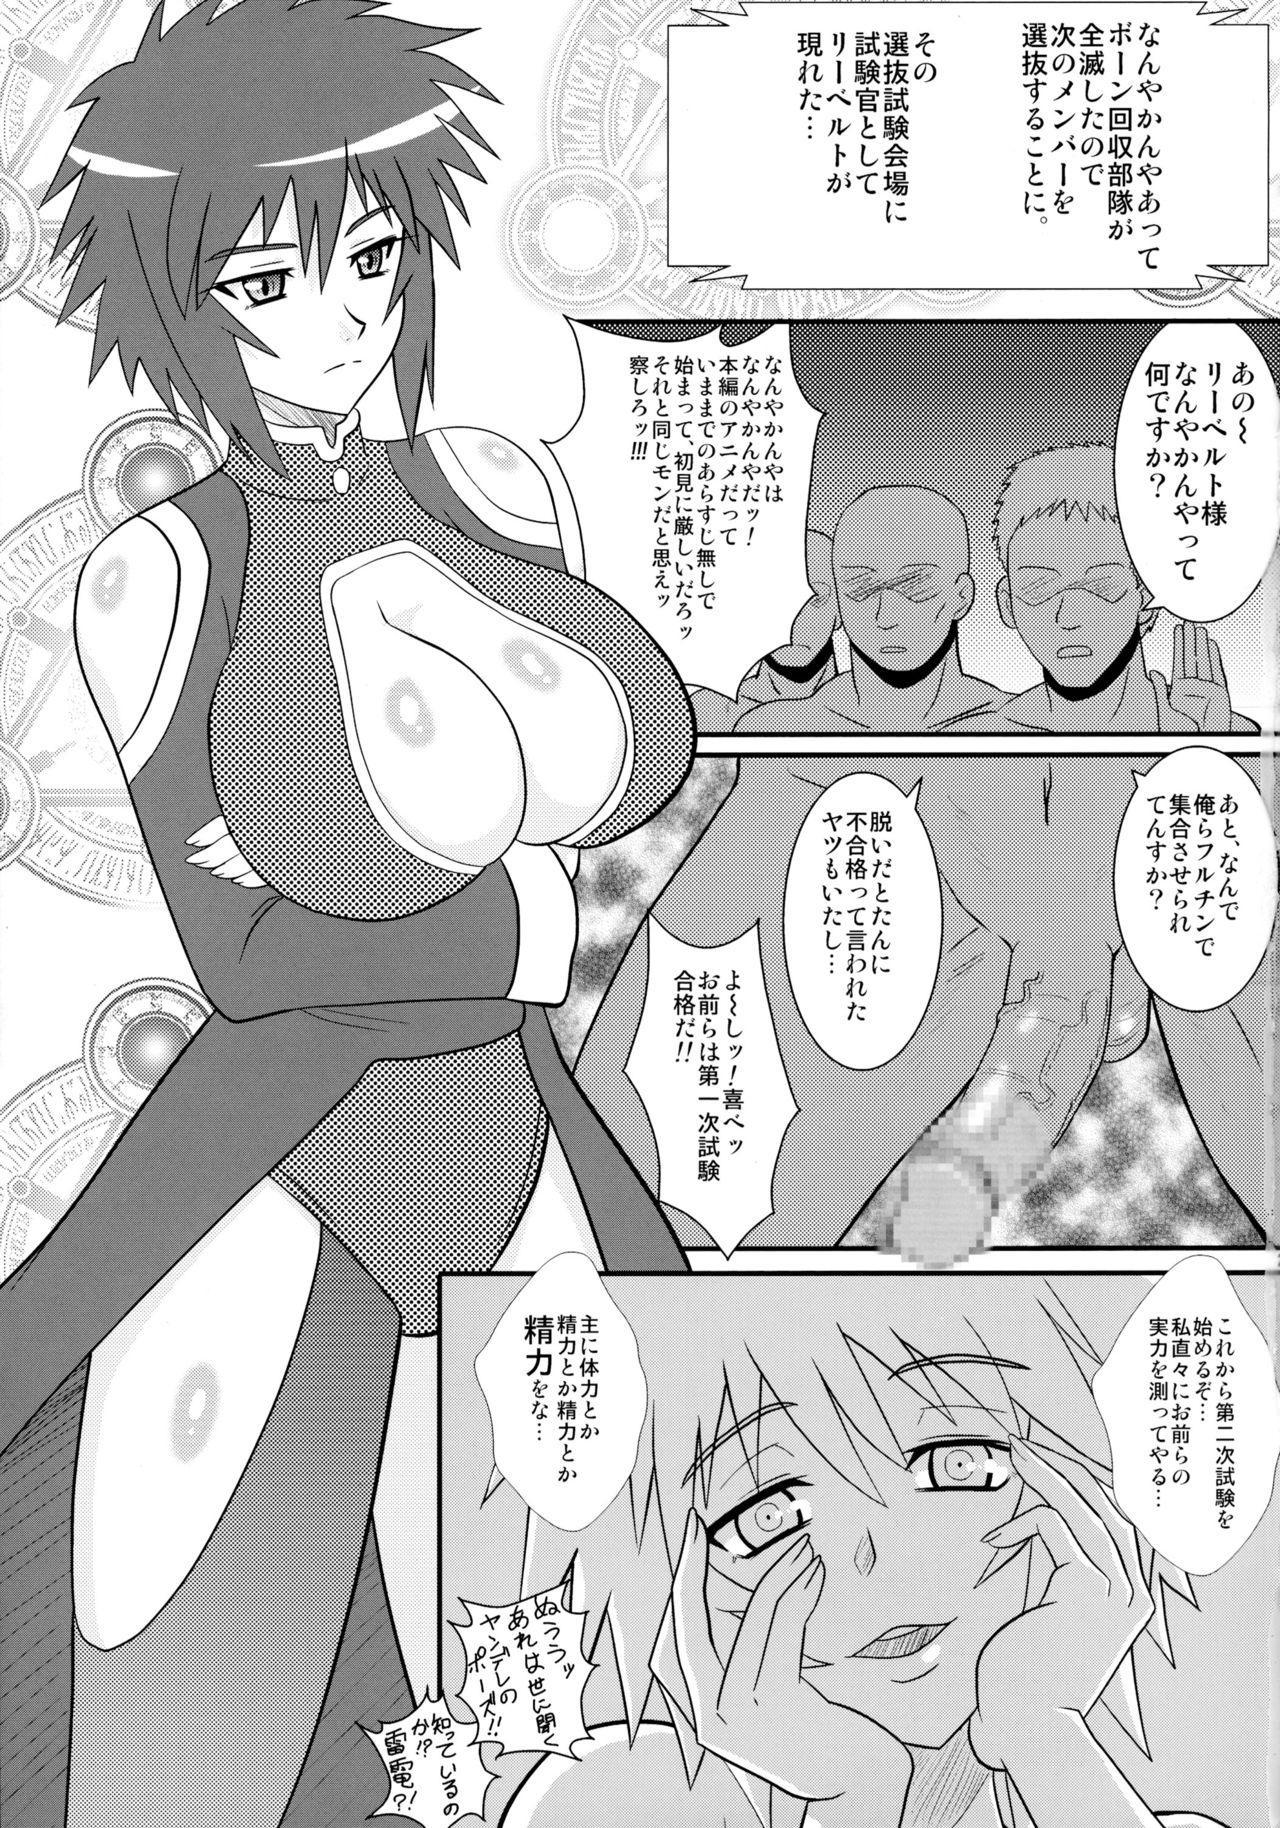 Oshiete Try-san 22